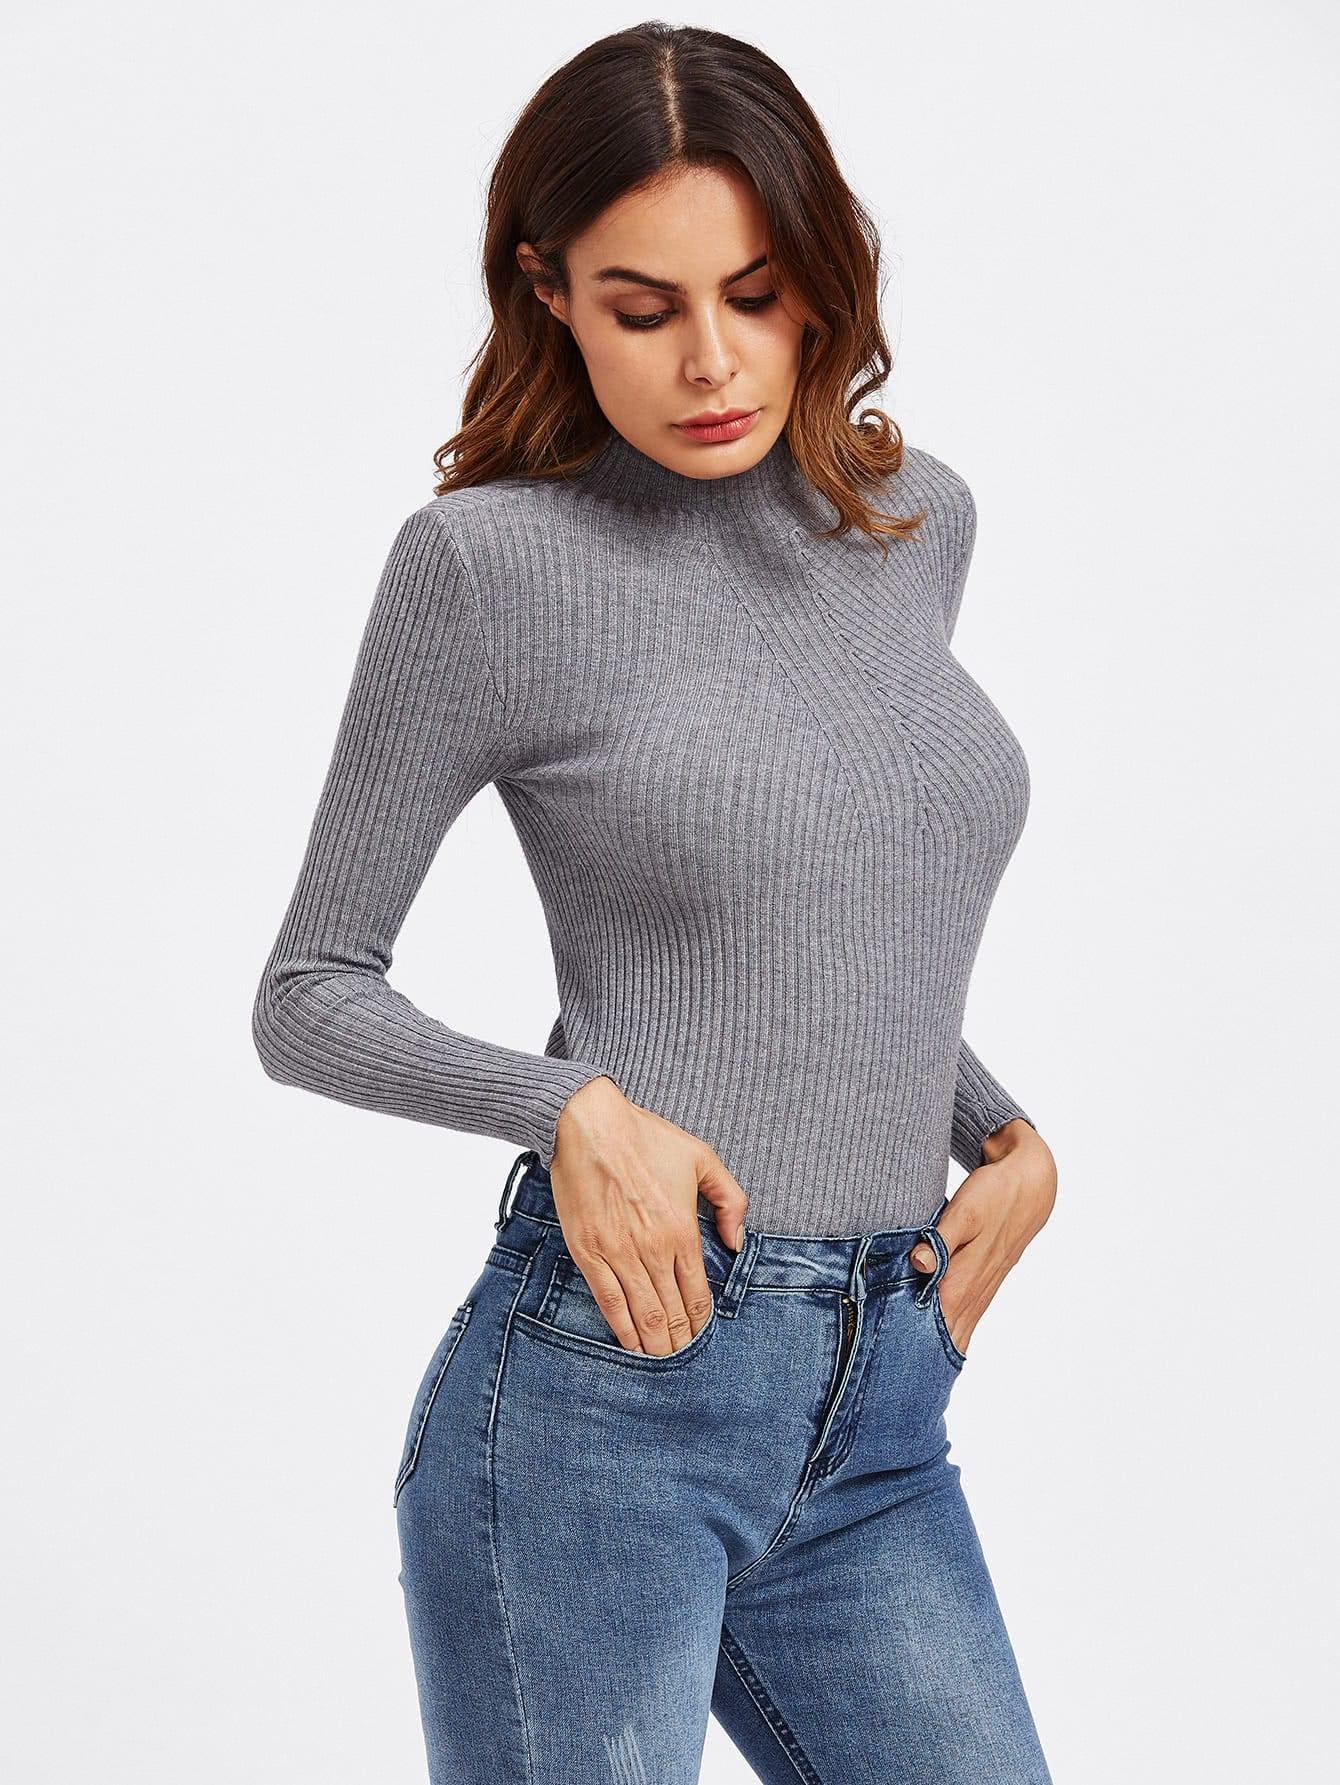 Orange Turtleneck Sweater   Her Sweater